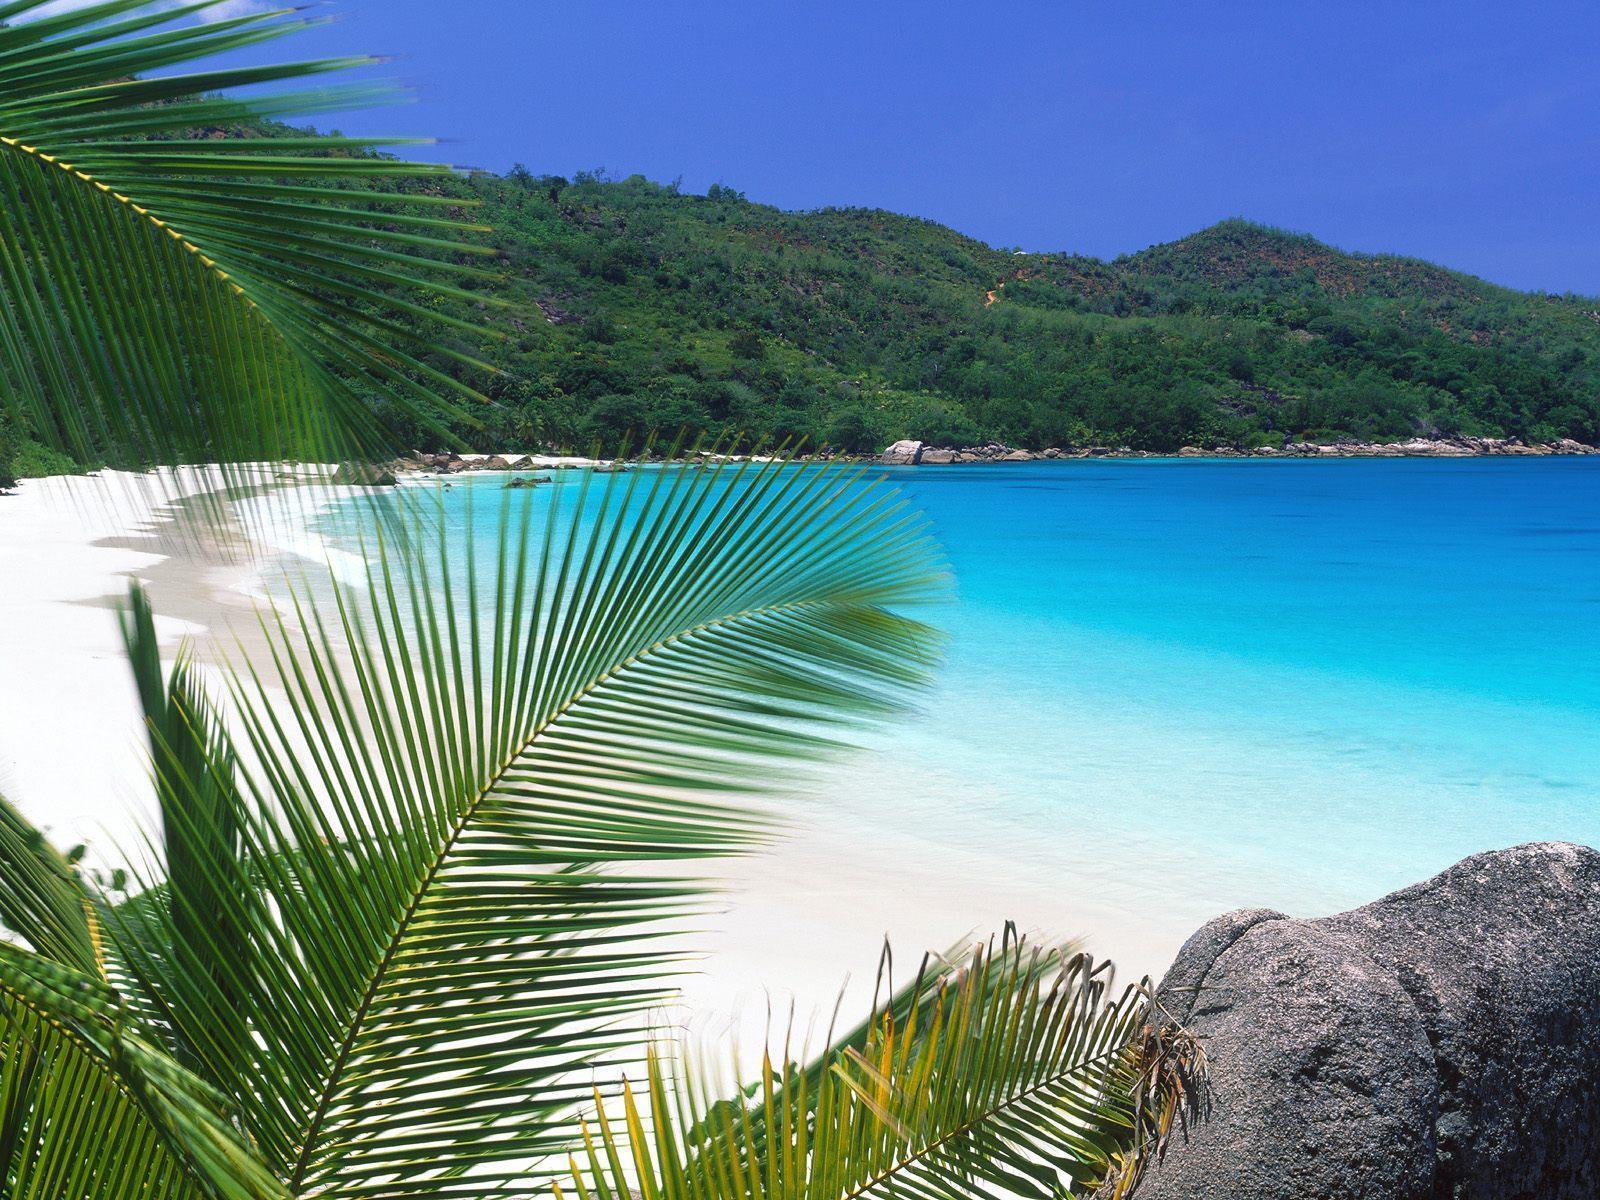 Tropical Island Desktop Backgrounds 1600x1200